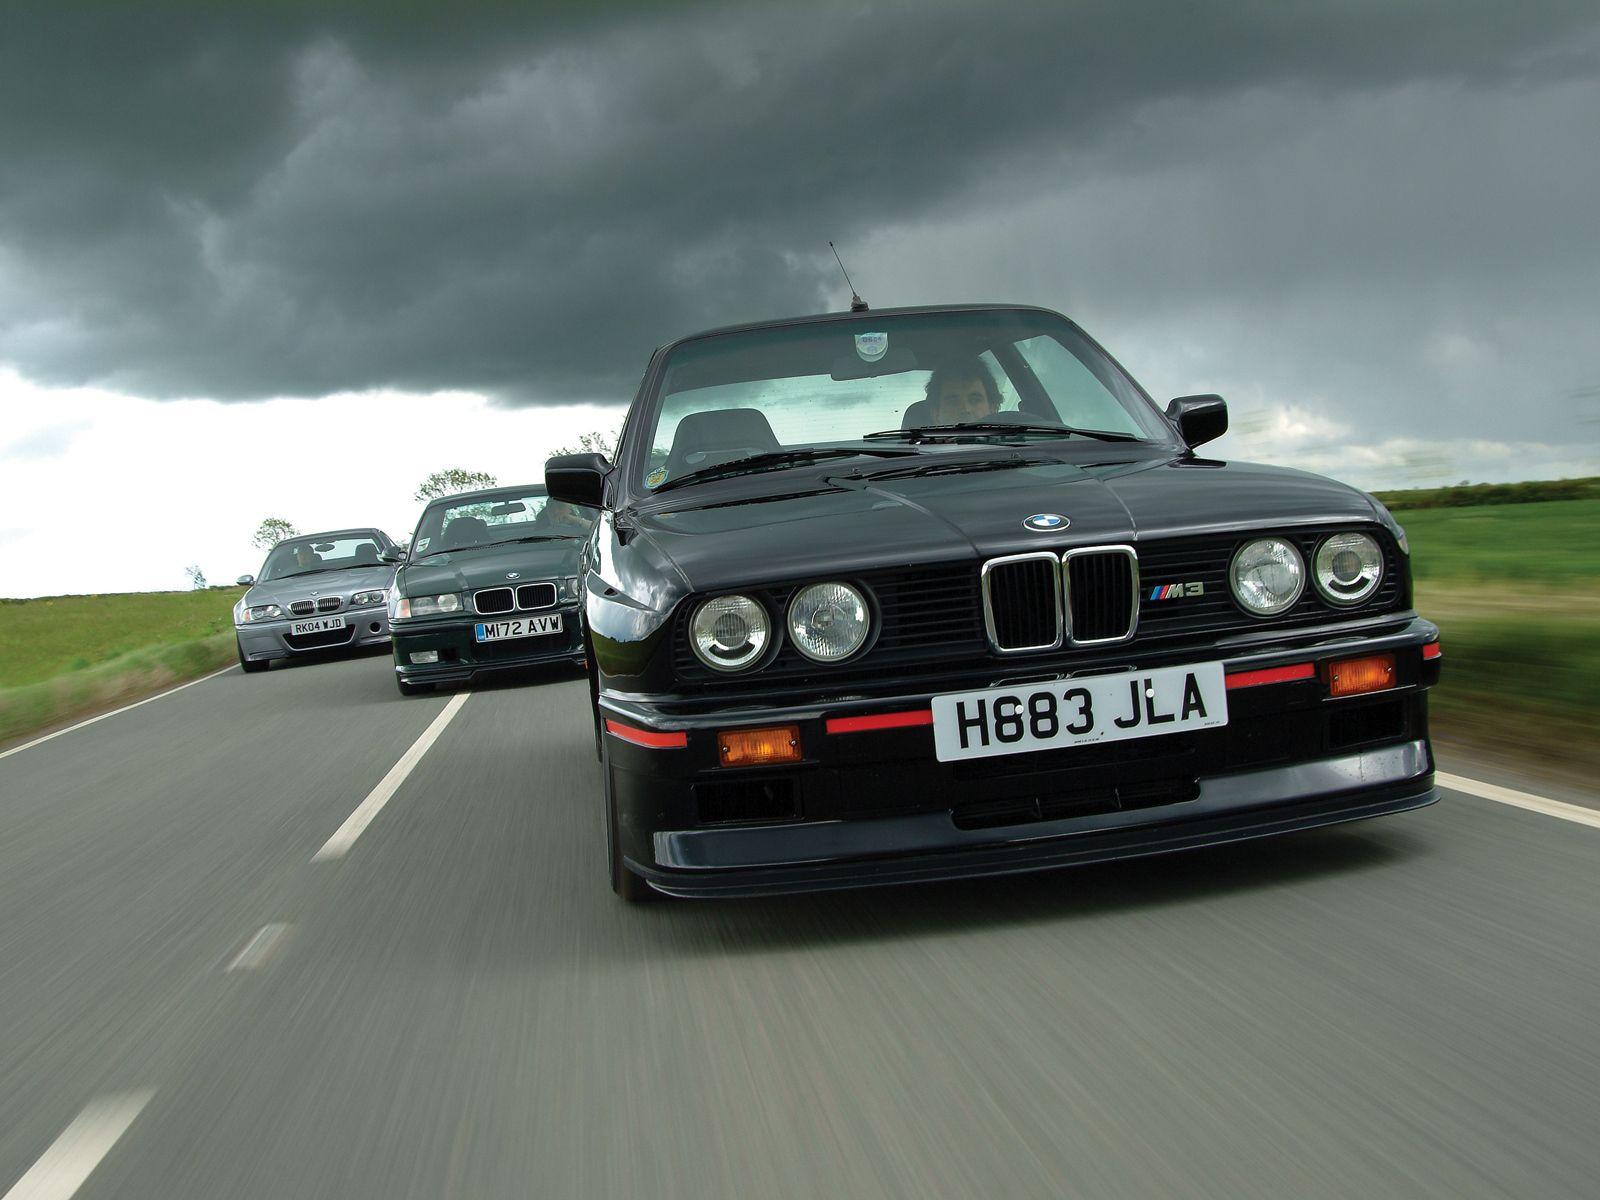 BMW M3 E30  BMW  M3  M series  E30  classic cars  classic